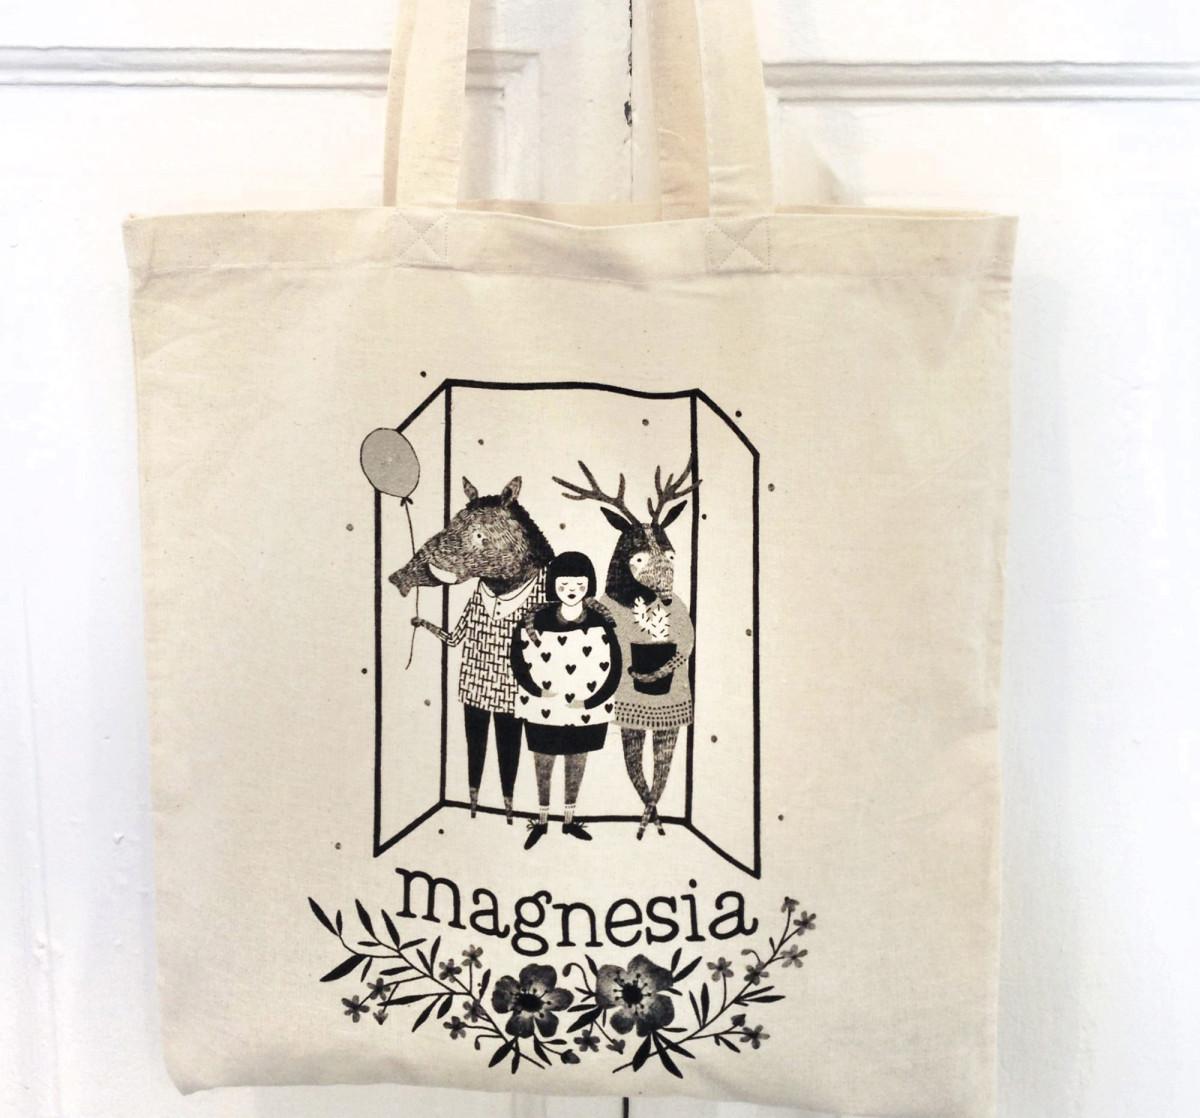 Magnesia_bag_Liekeland_illustration_2000pix